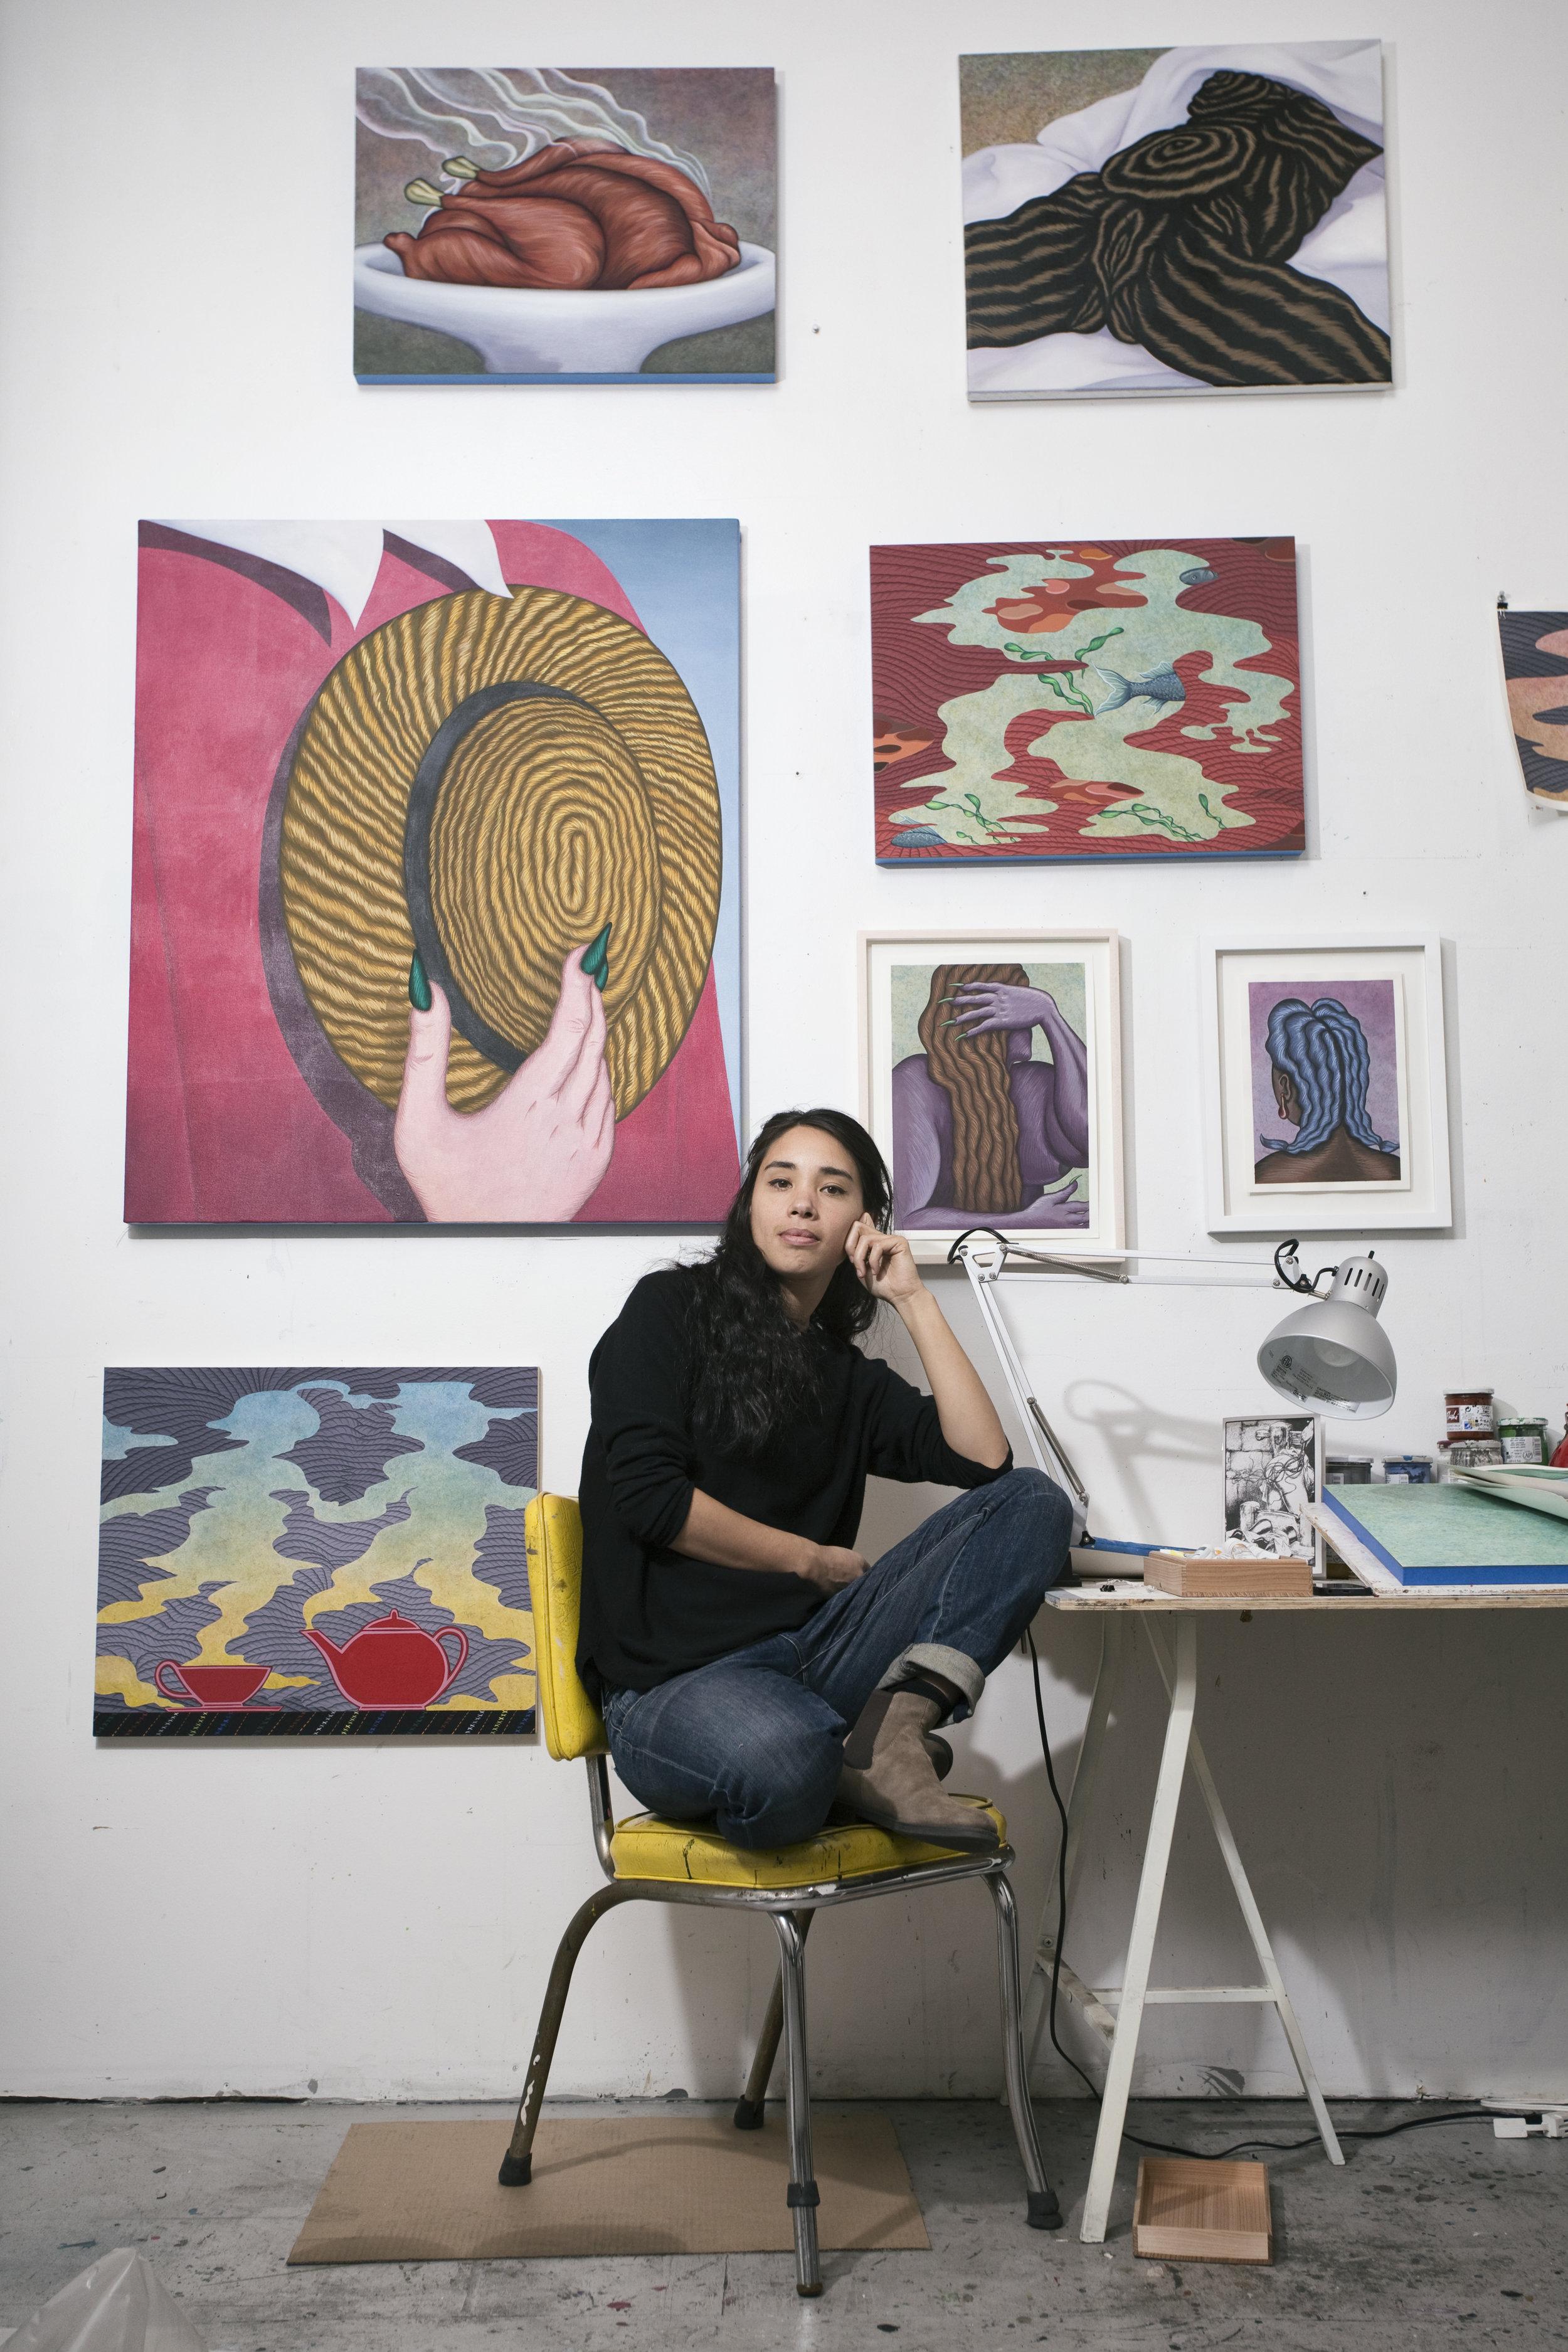 Julie in her Brooklyn Studio. Photo by Maxim Ryazansky.